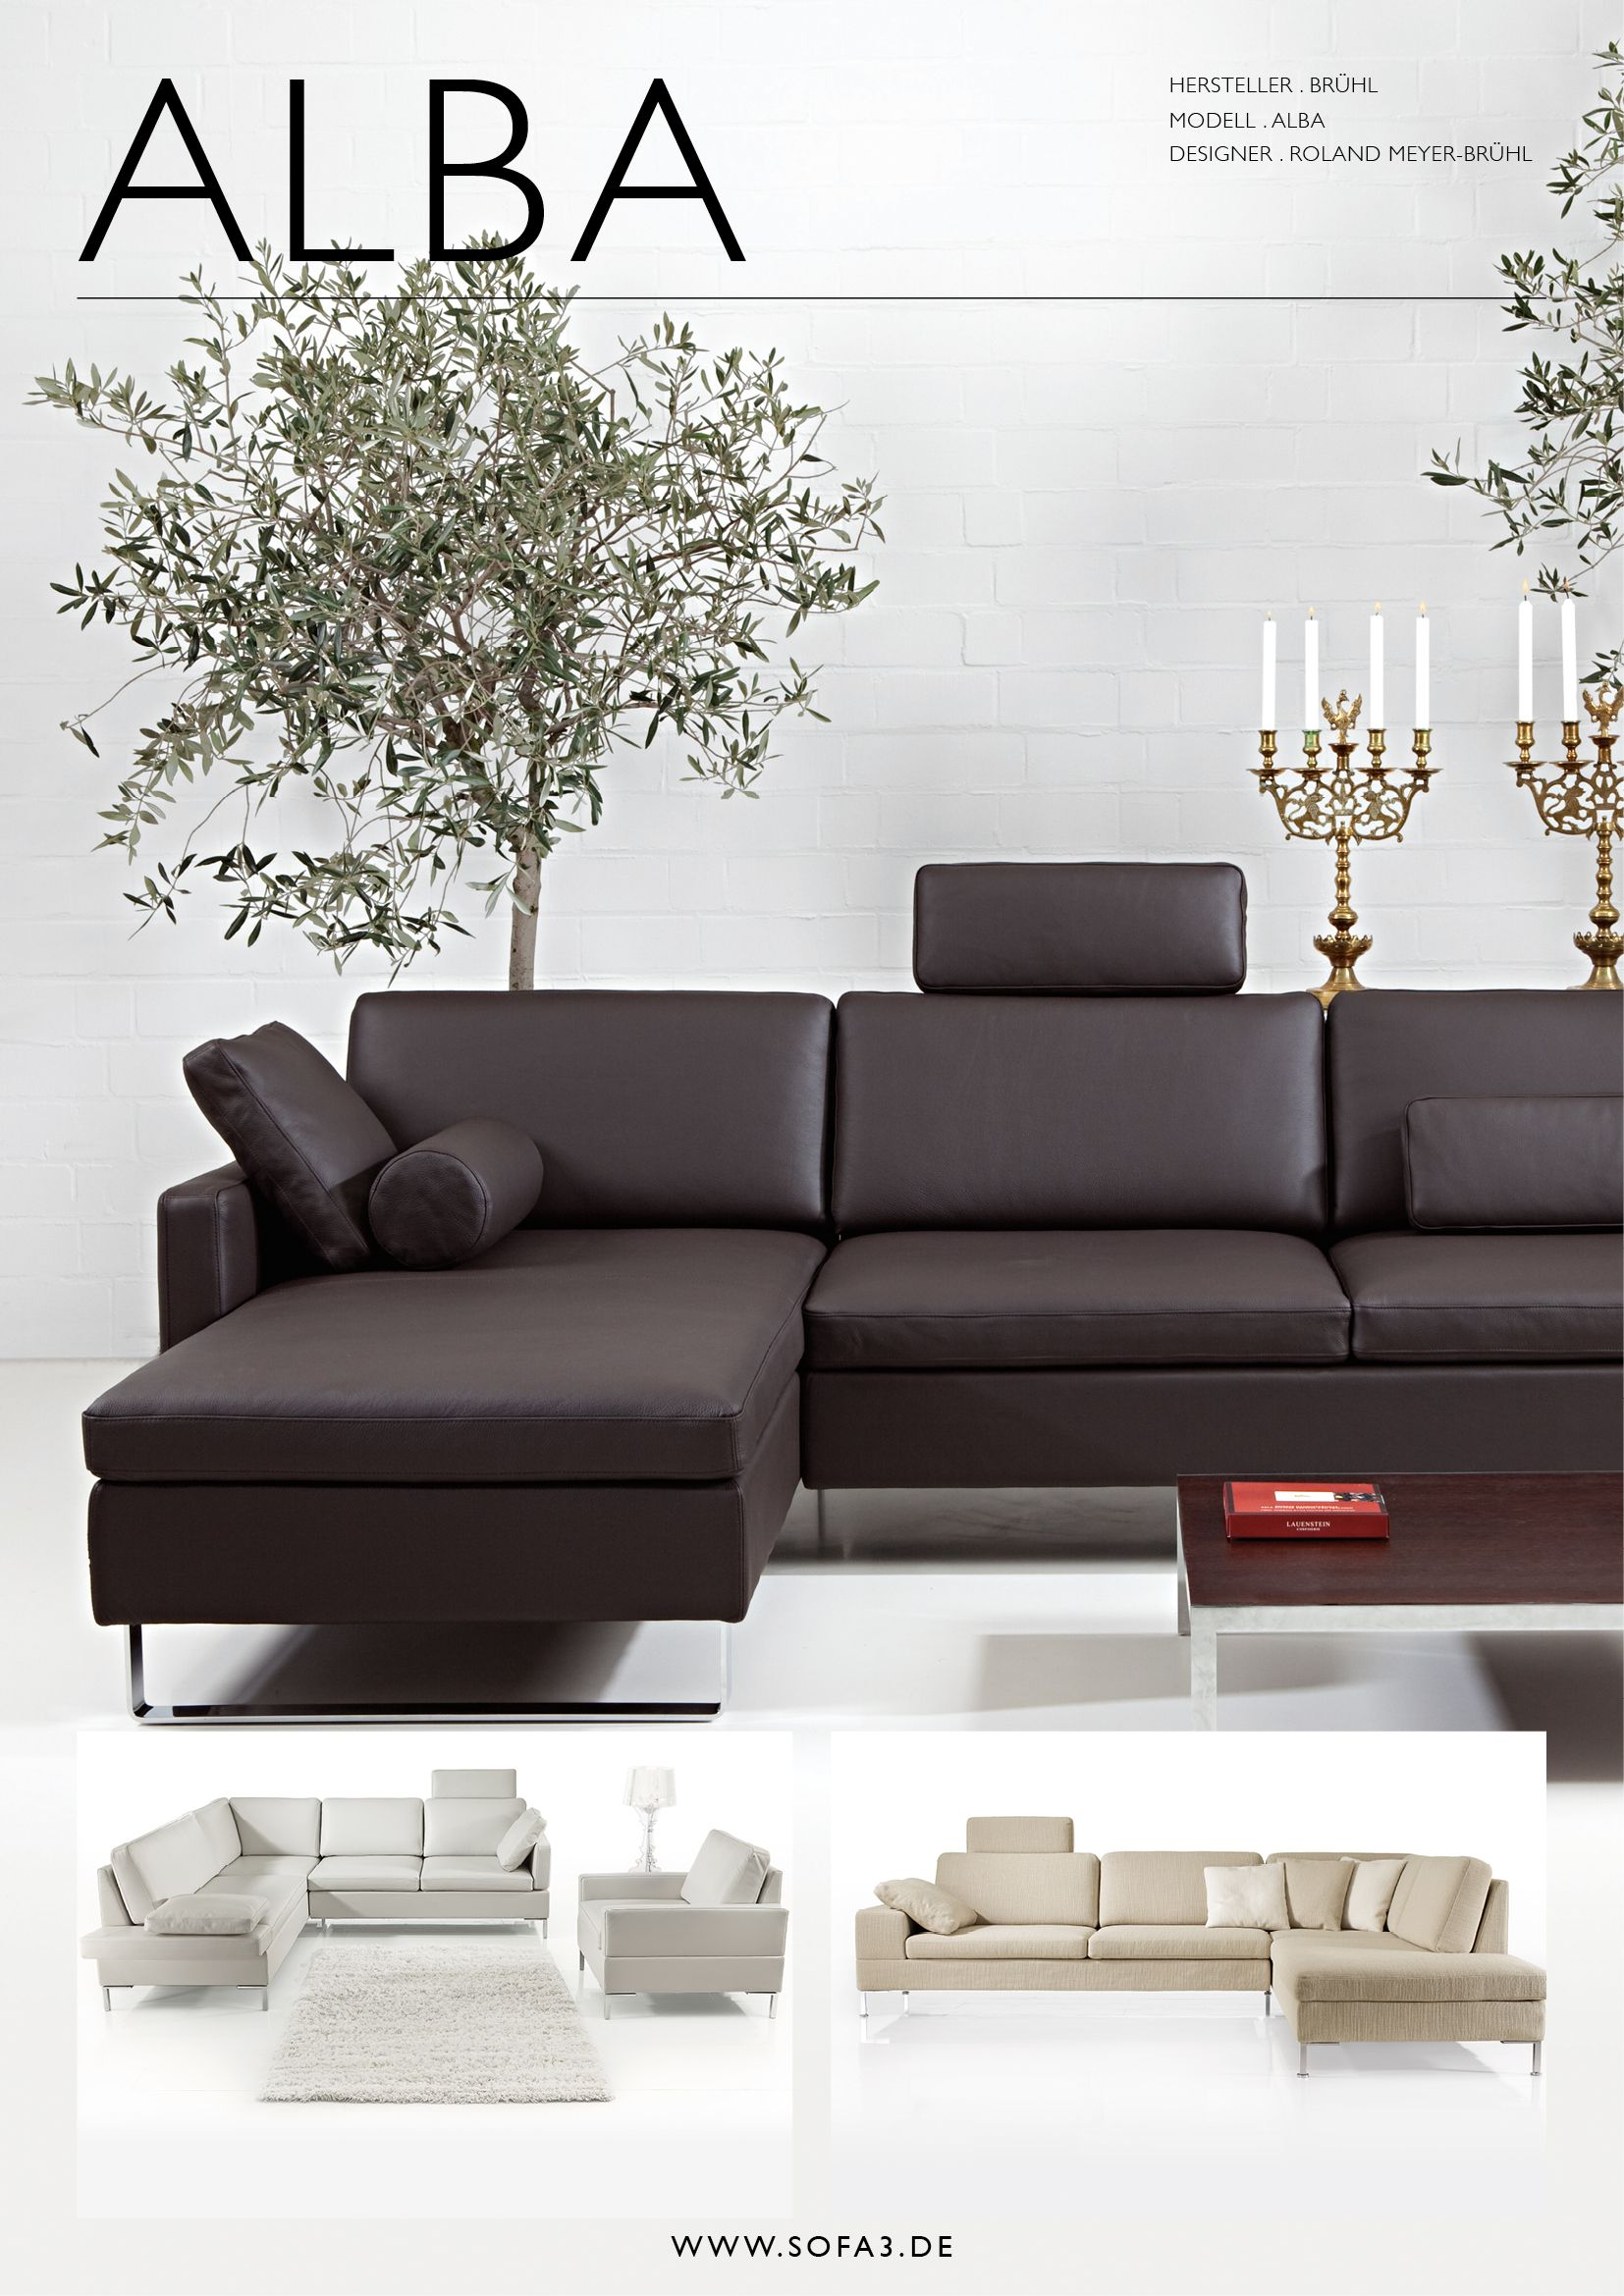 Brhl Sofa Affordable Fabric Sofa Amber Fabric Sofa By Brhl With